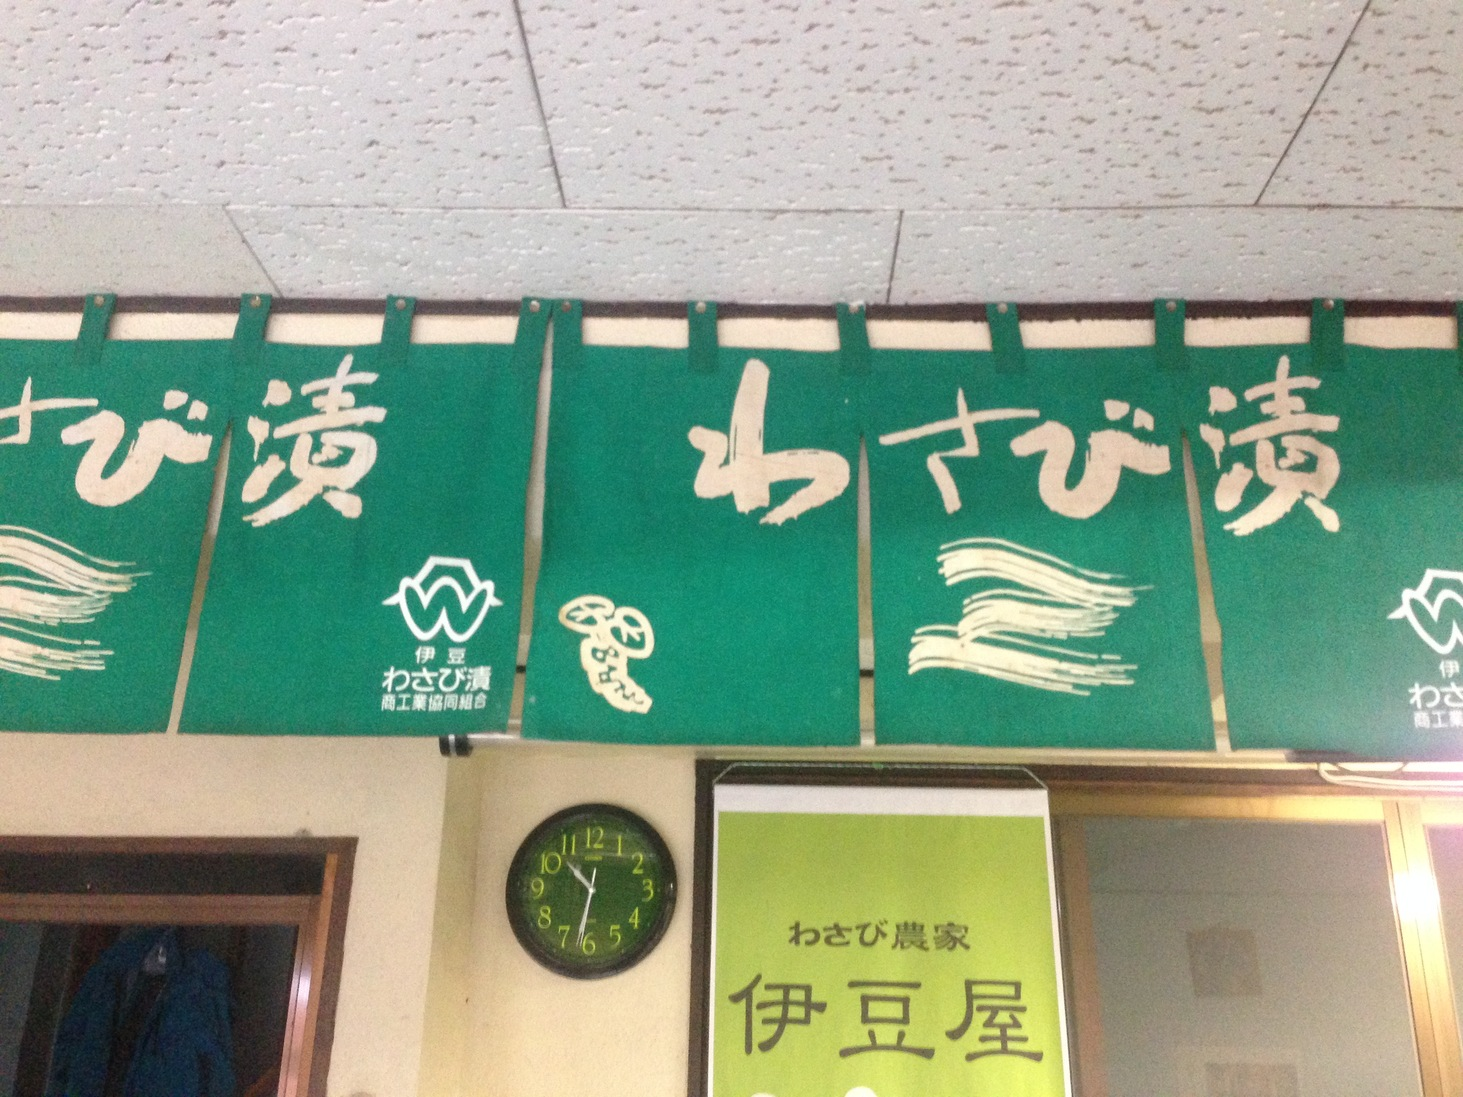 わさび農家 伊豆屋 name=